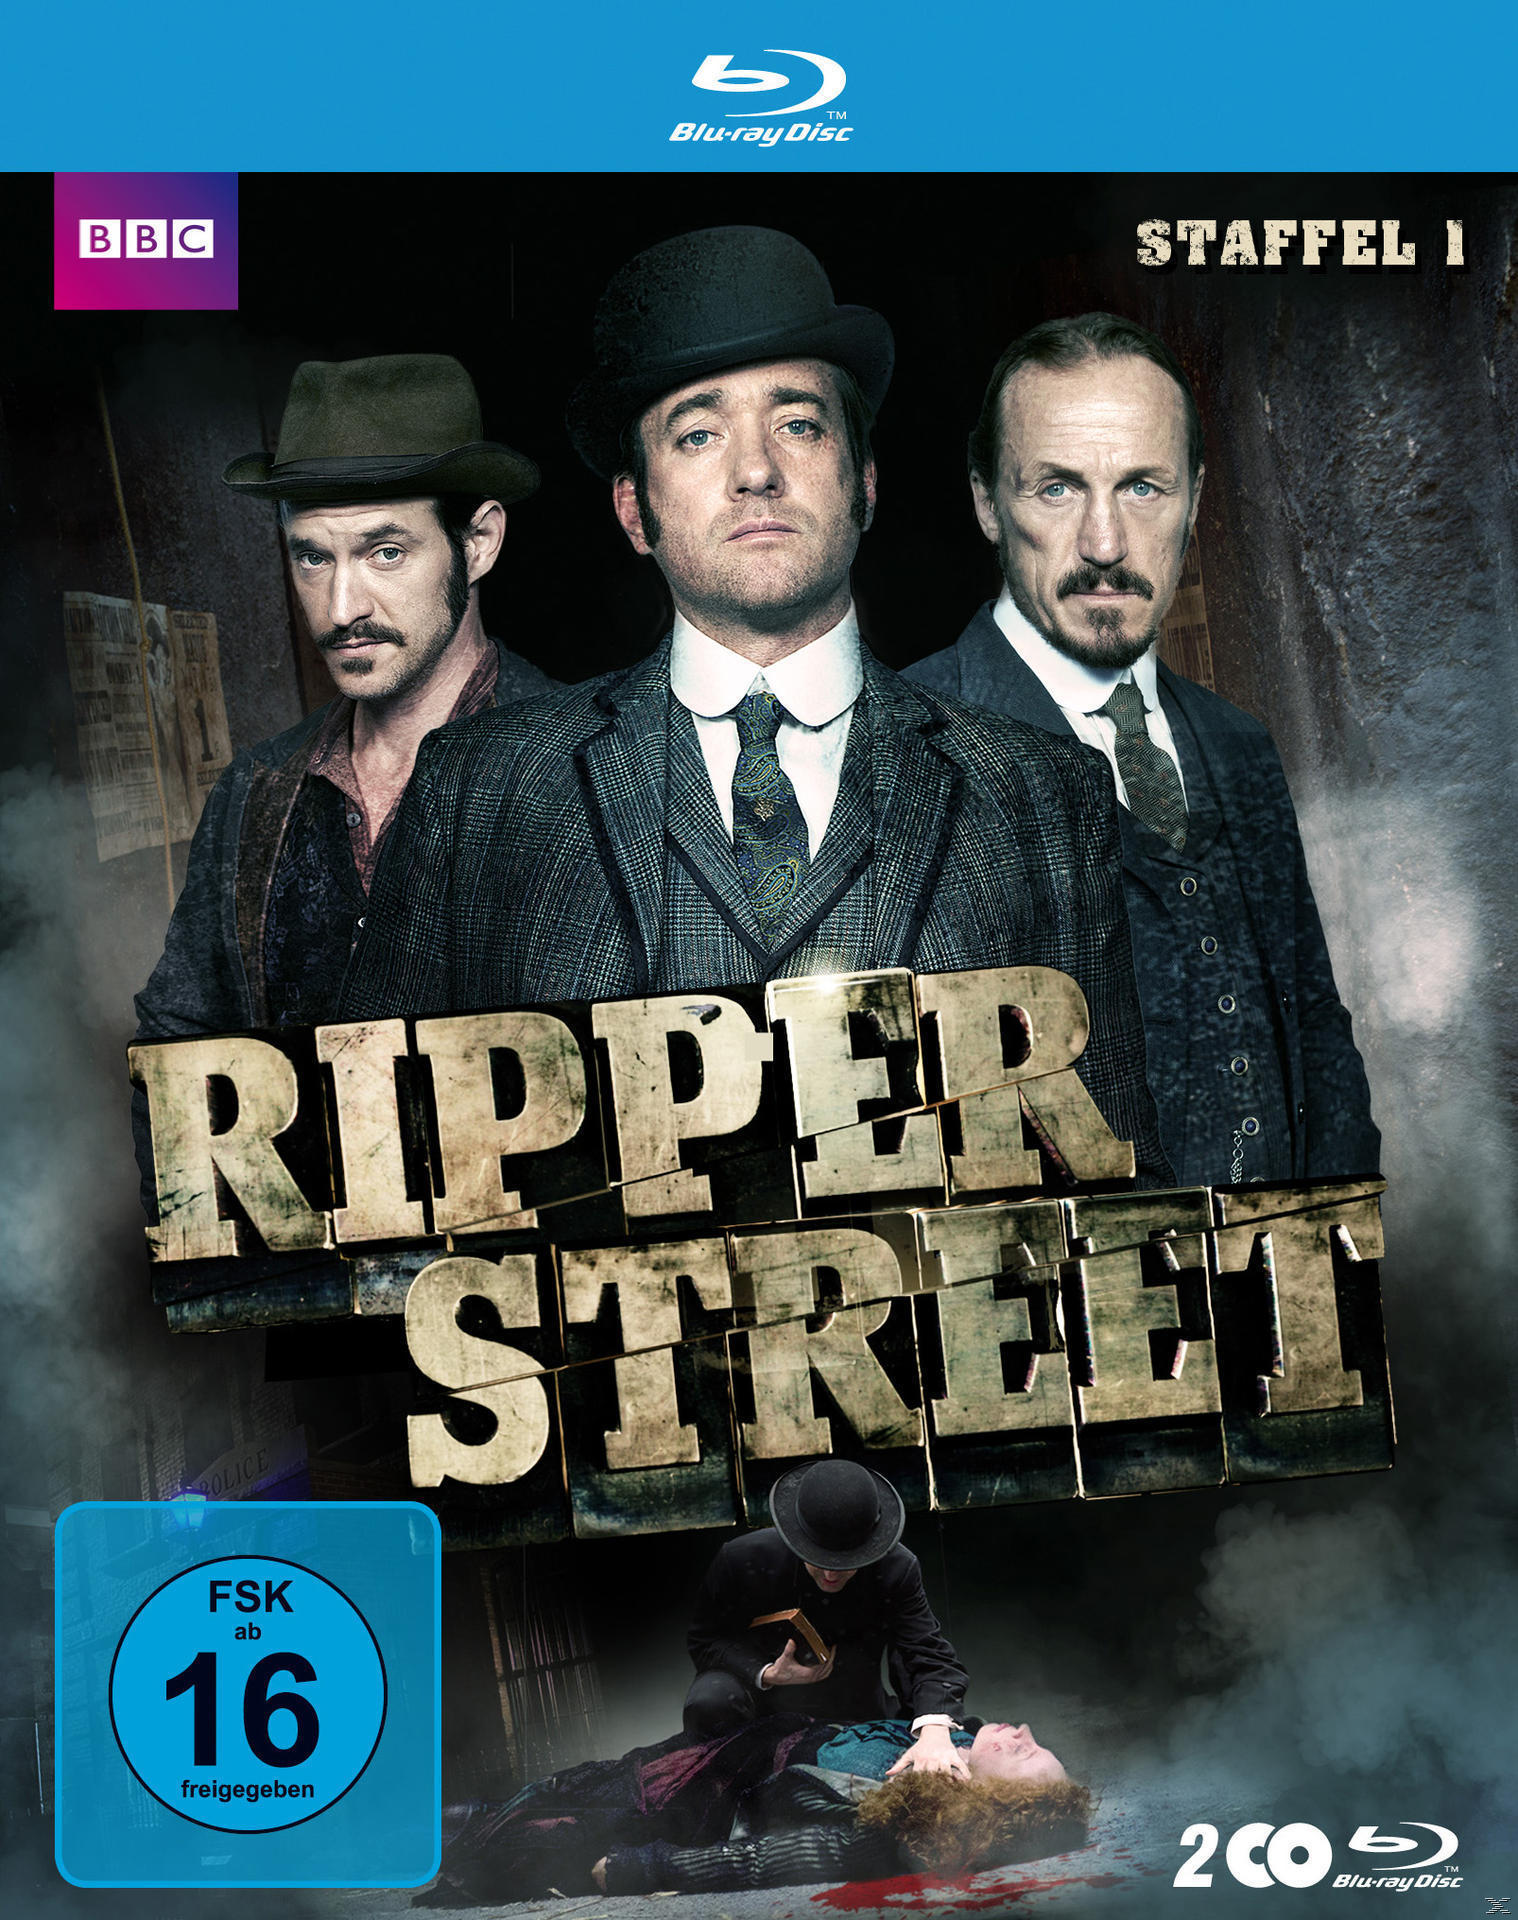 Ripper Street - Staffel 1 (BLU-RAY) für 19,46 Euro